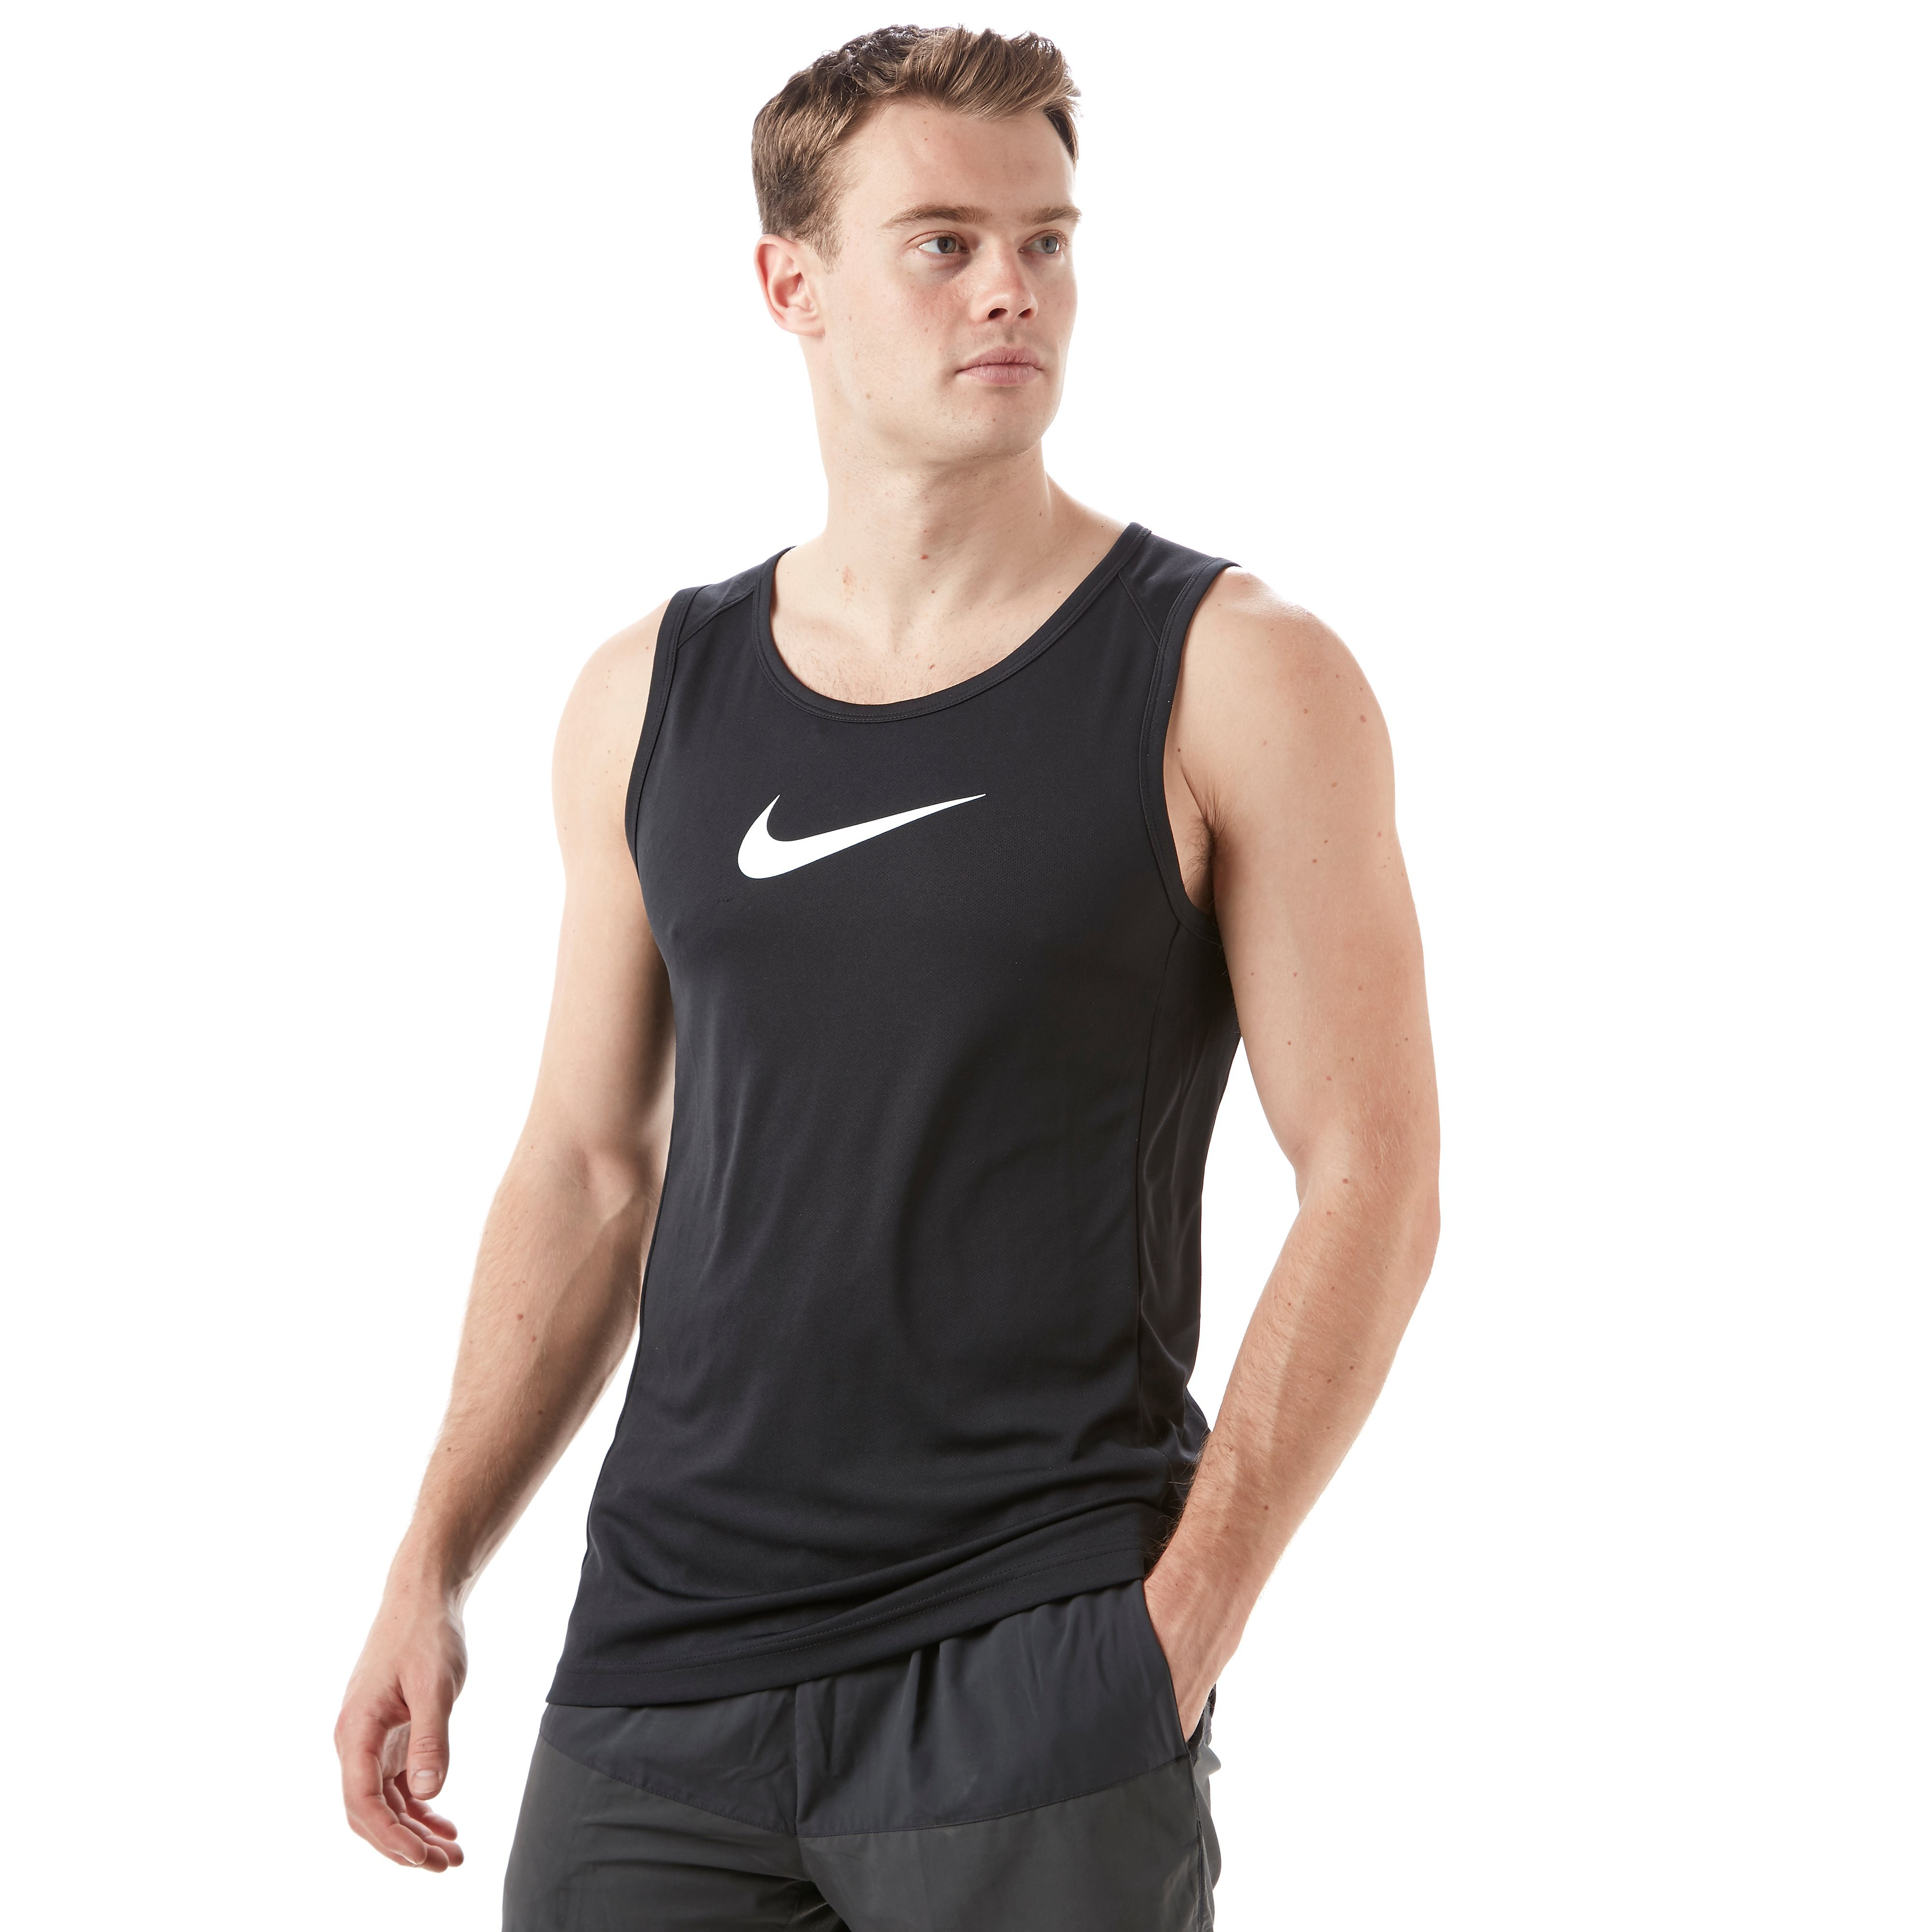 Nike Dry Elite Men's Basketball Tank Top